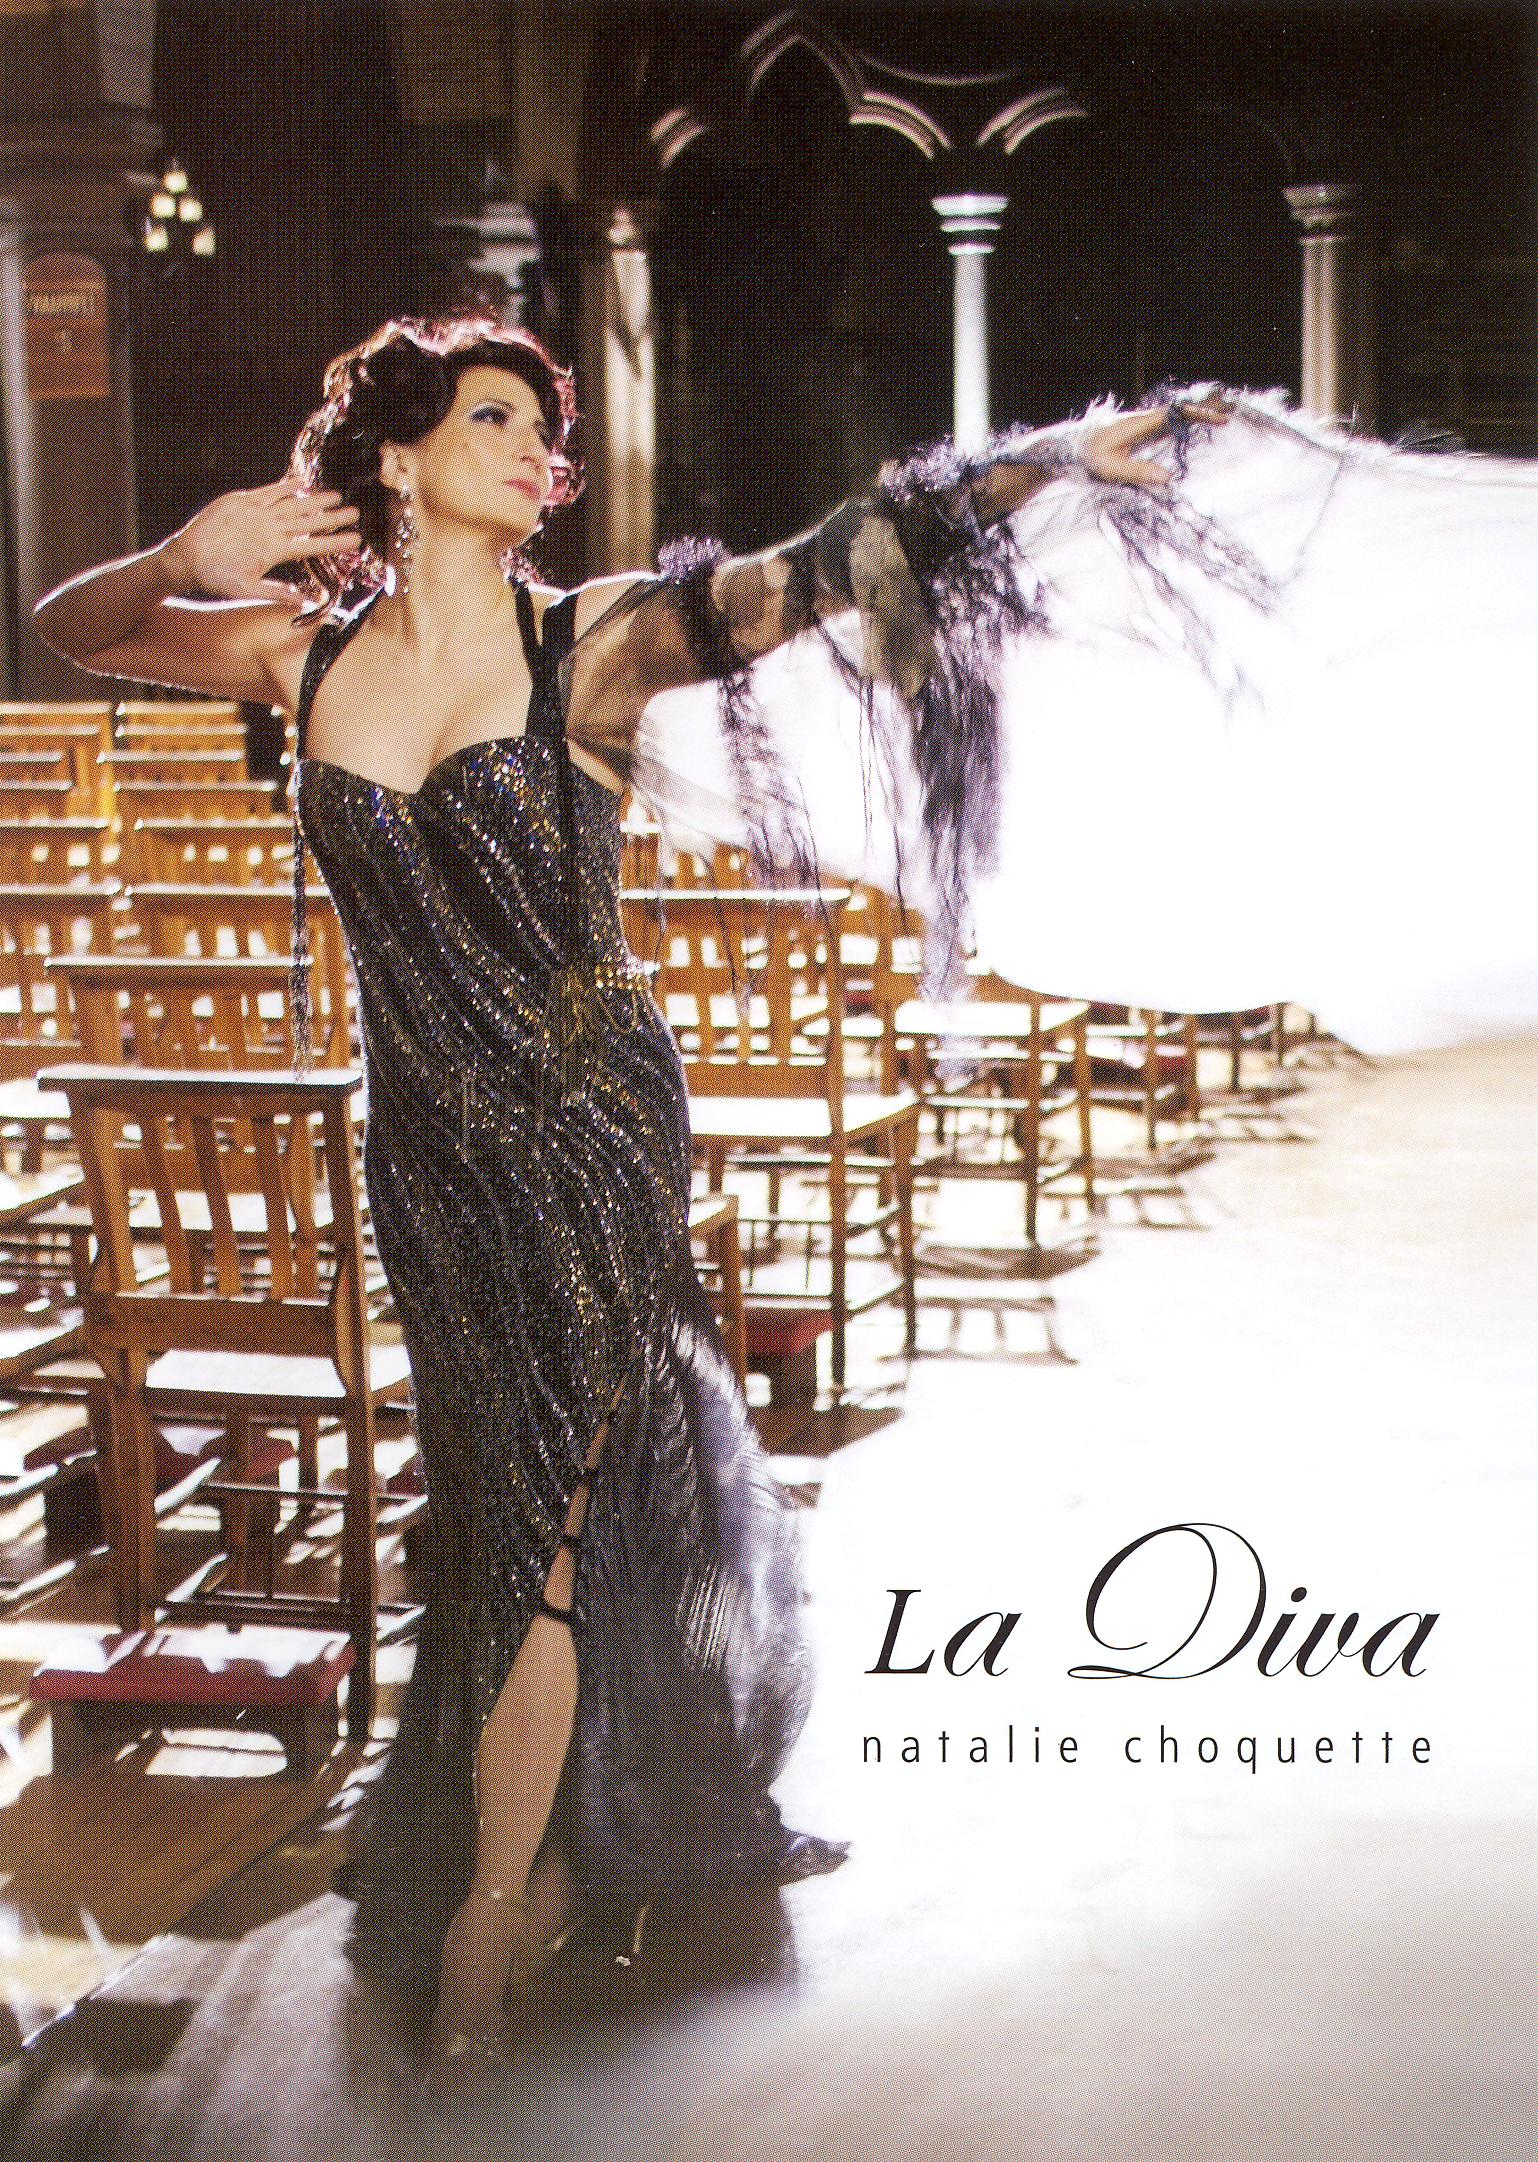 Natalie Choquette: La Diva